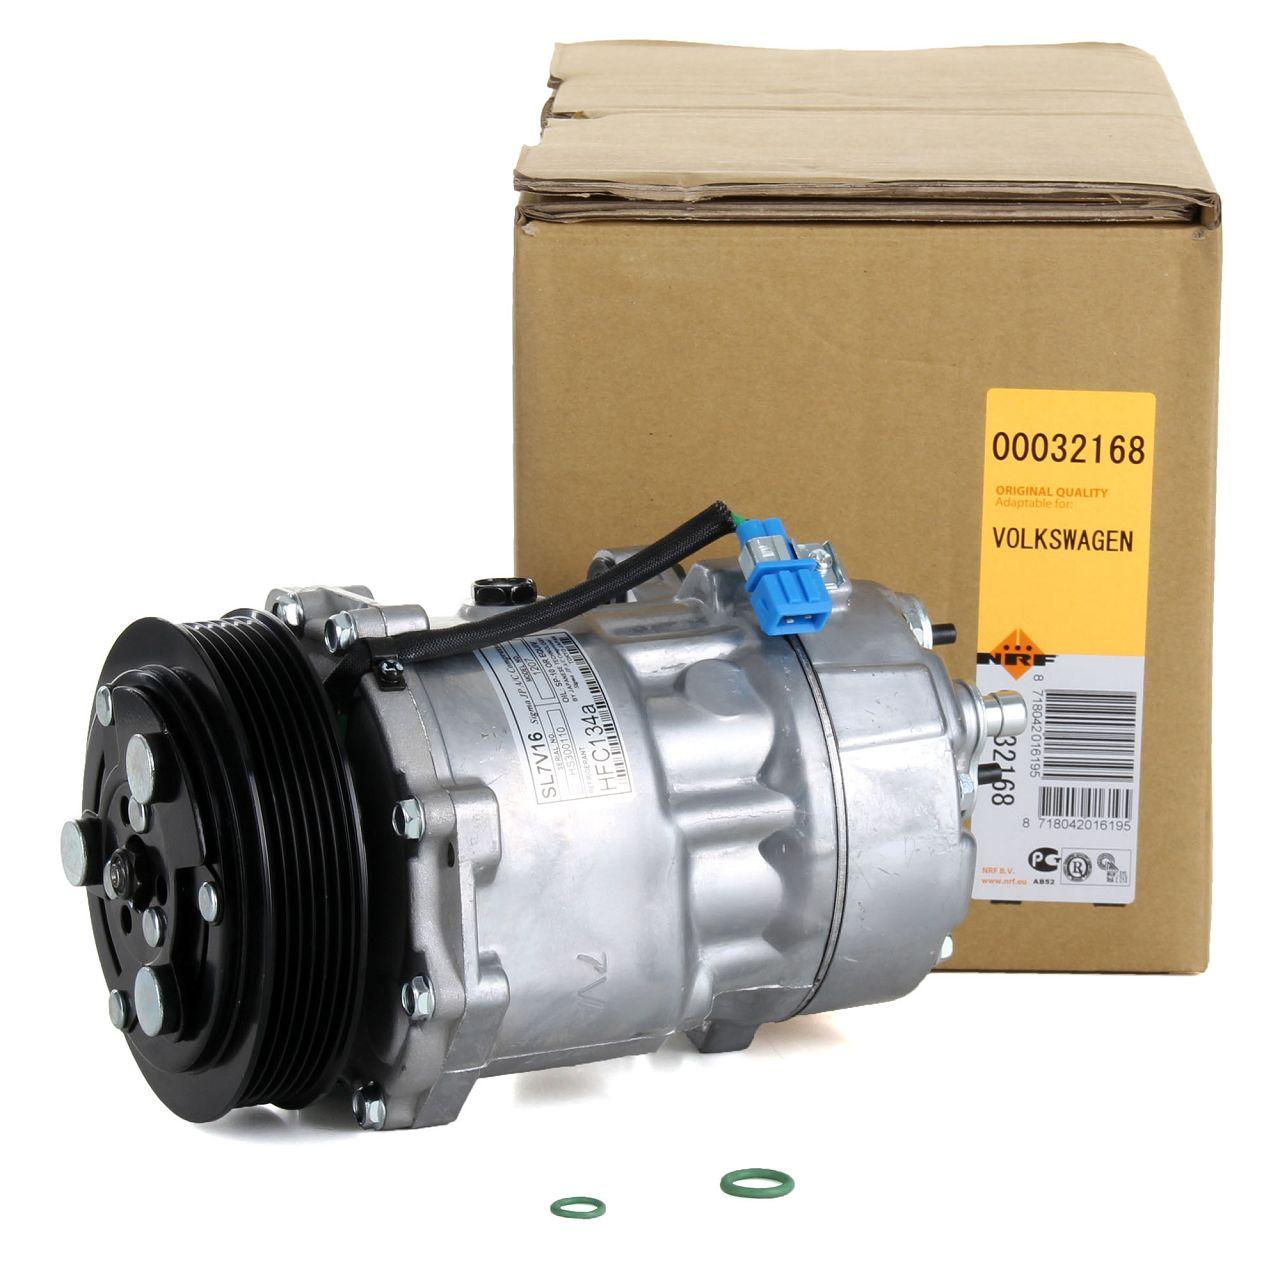 NRF 32168 Kompressor Klimaanlage EASY FIT für VW LT 28-35/46 II TRANSPORTER T4